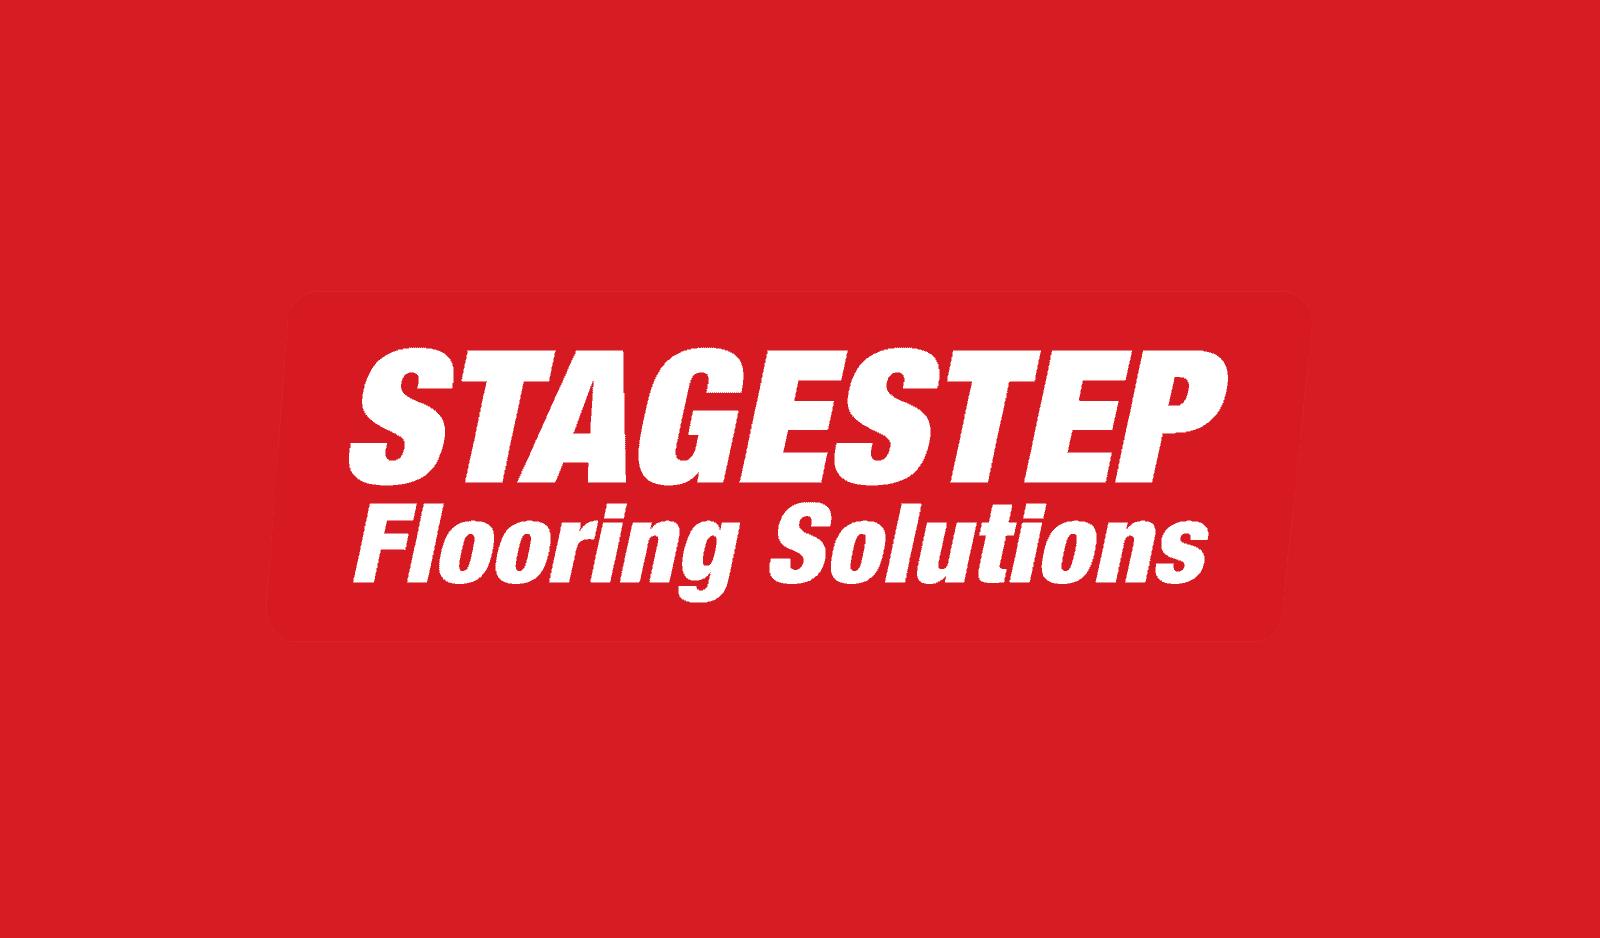 Stagestep-5.16.19